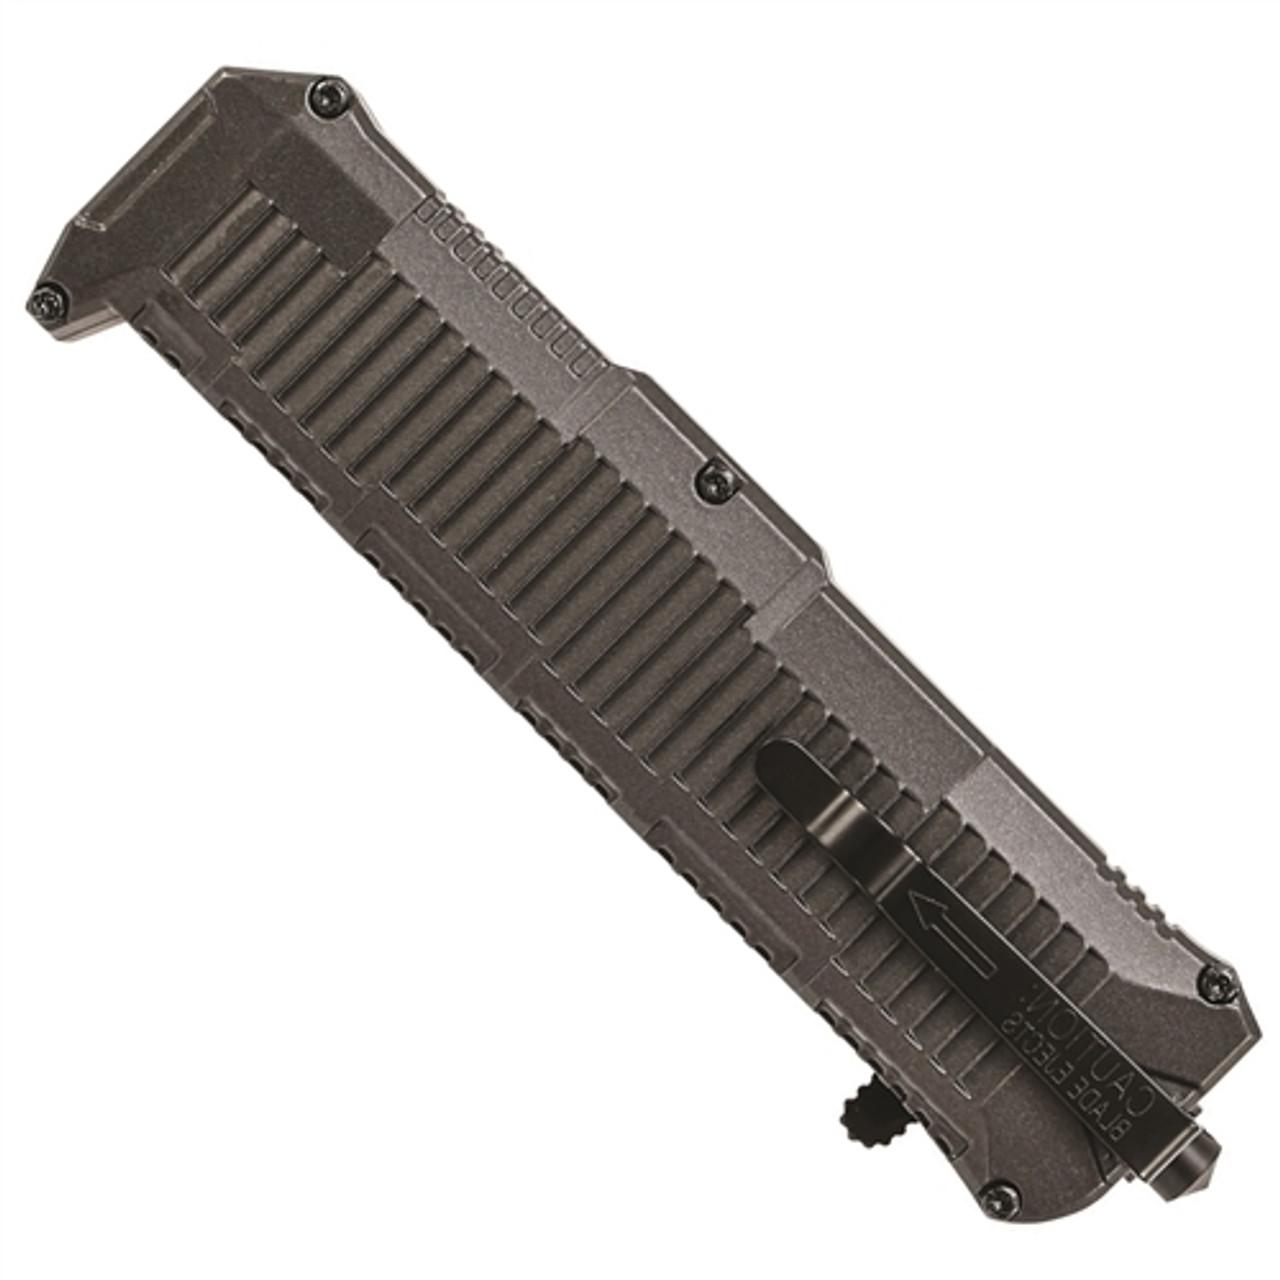 Schrade SCHOTF8TBS OTF Assist Knife, Black Tanto Point Combo Blade